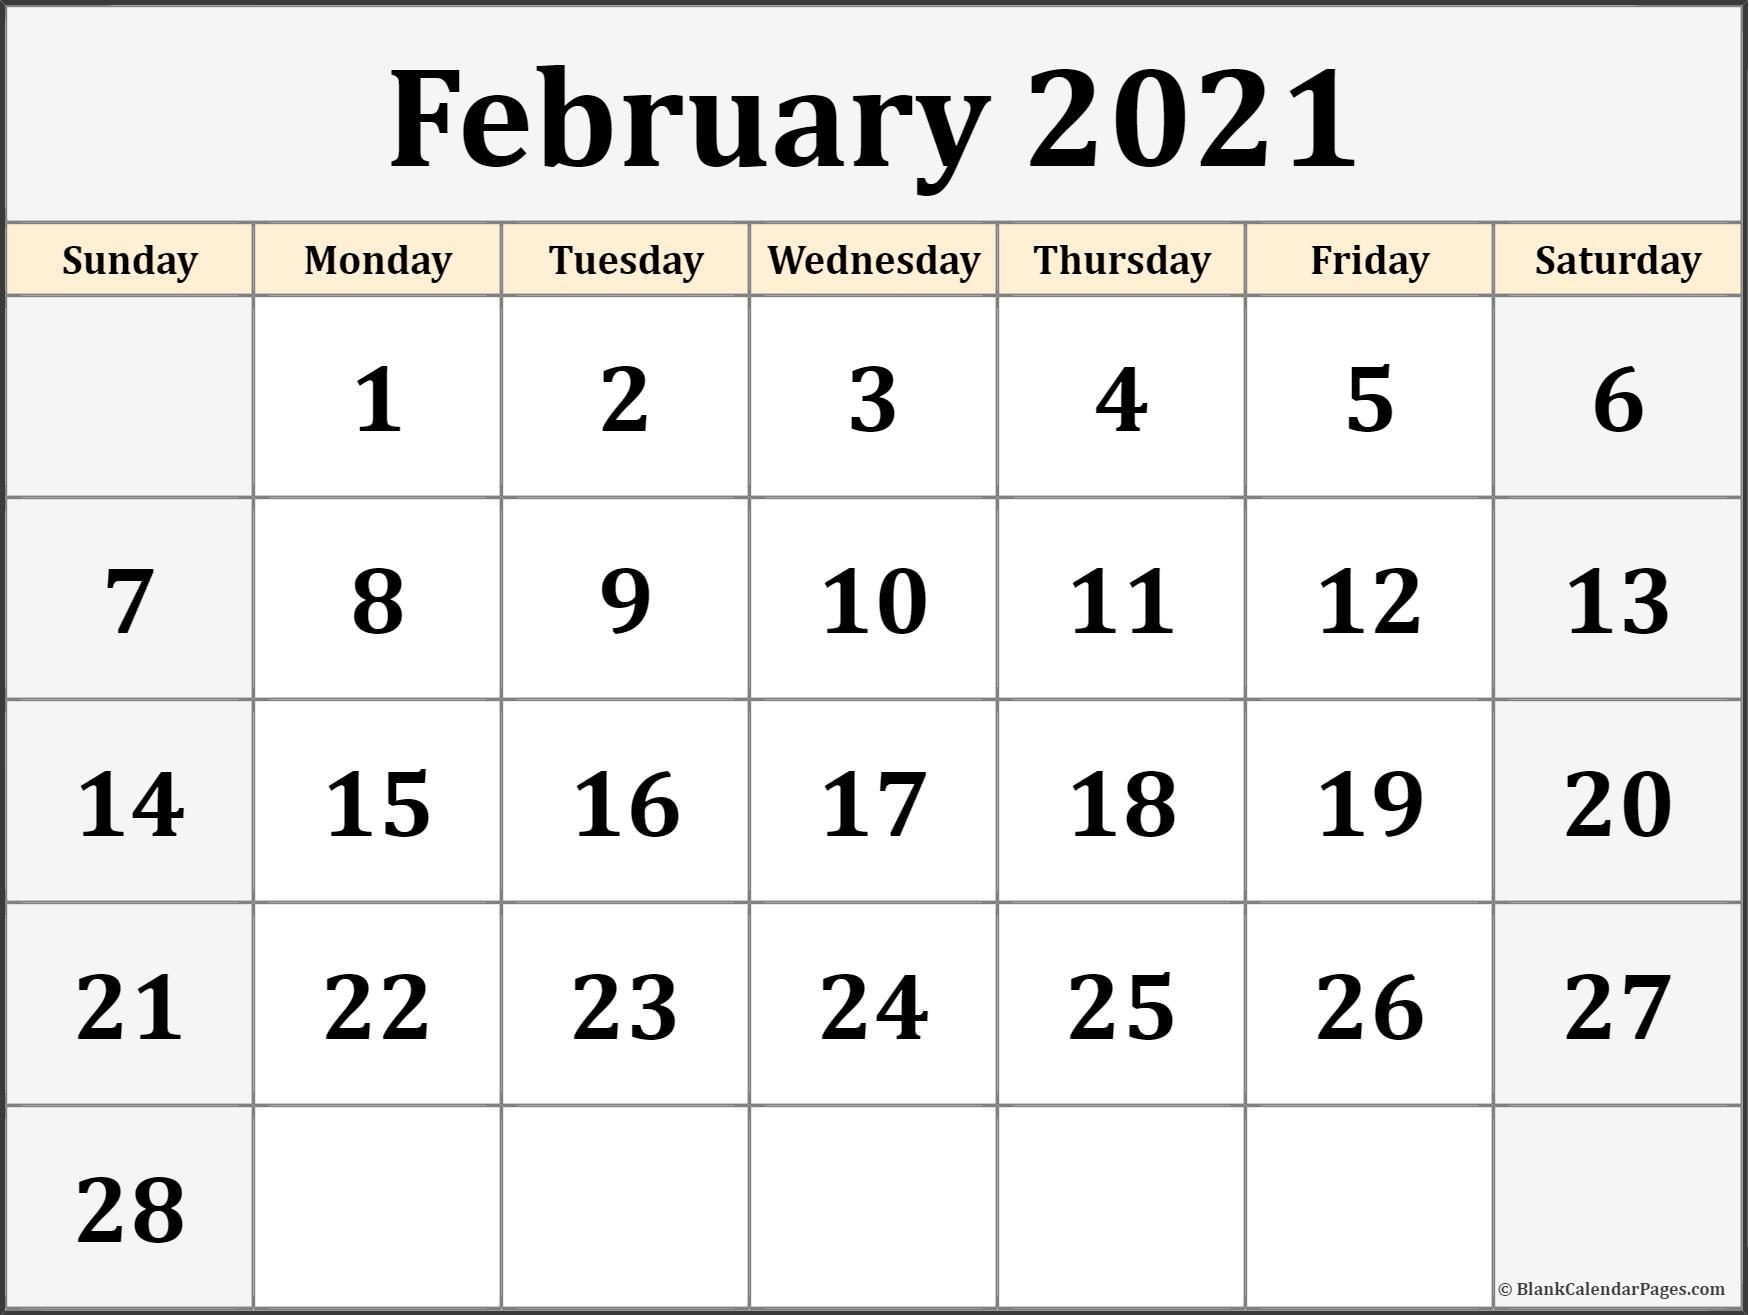 Free Calendars 2021 Printable | Calendar Printables Free Blank in Blank 2021 Calendar Printable Free